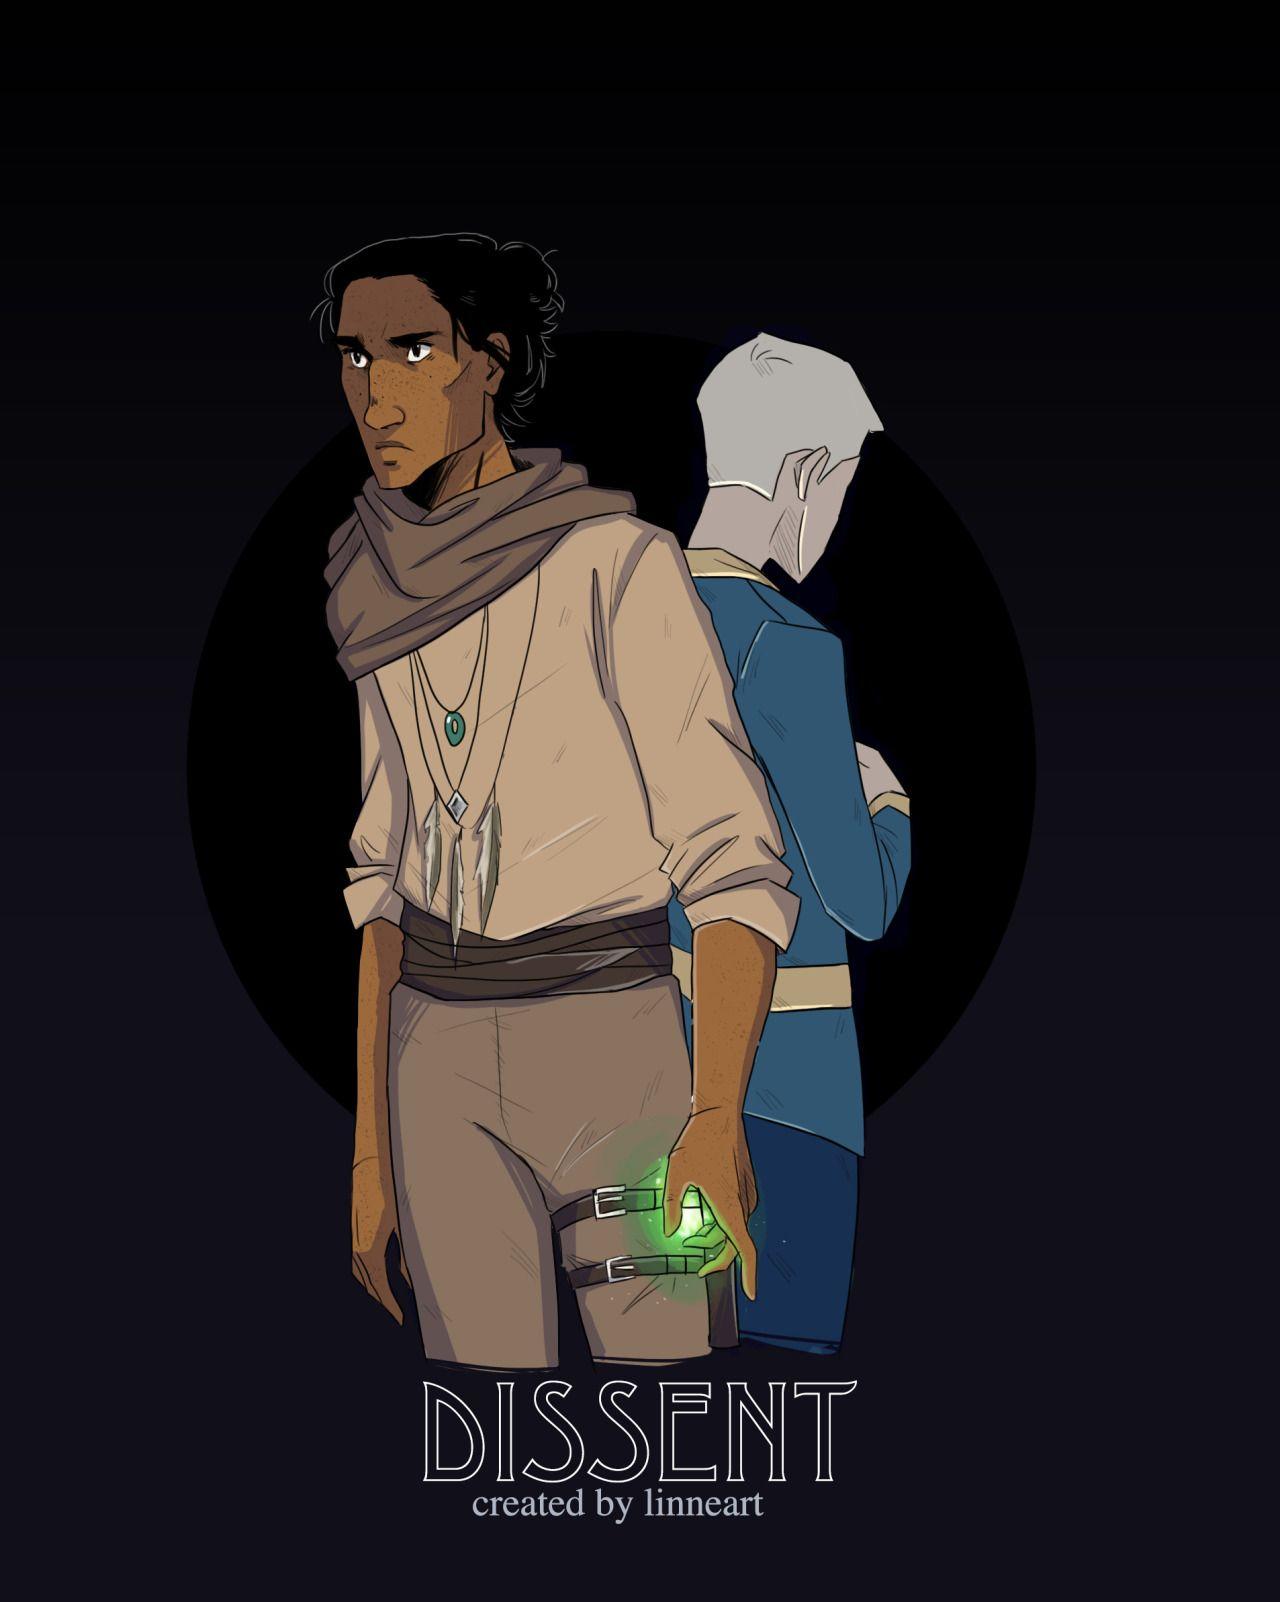 dissent-comic | Comics, Webcomic comics, Webcomic